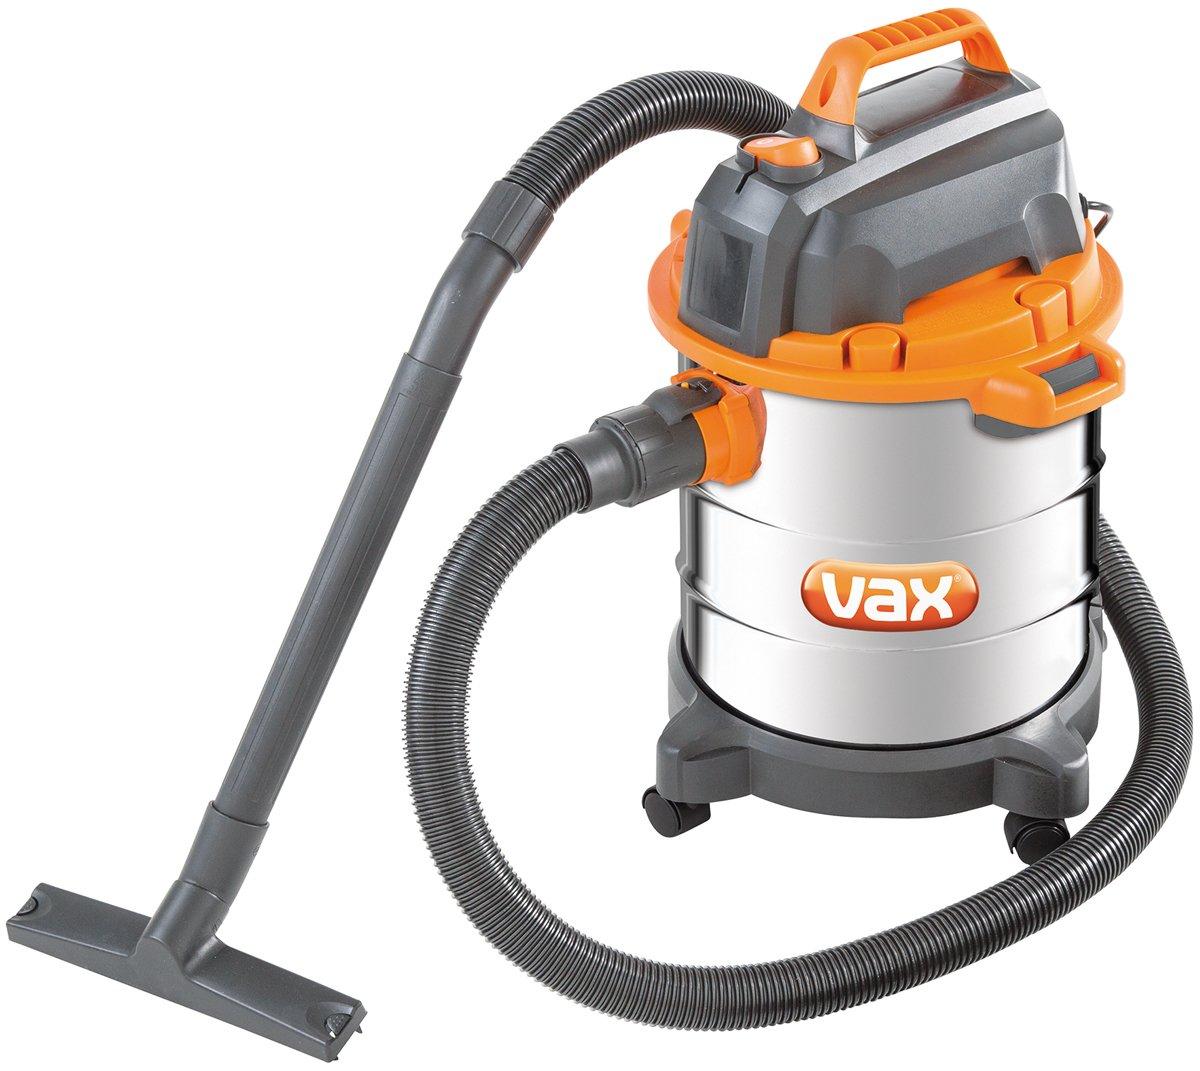 Pet Vax Carpet Shoo Wet Dry Vacuum Cleaner Carpet Vidalondon